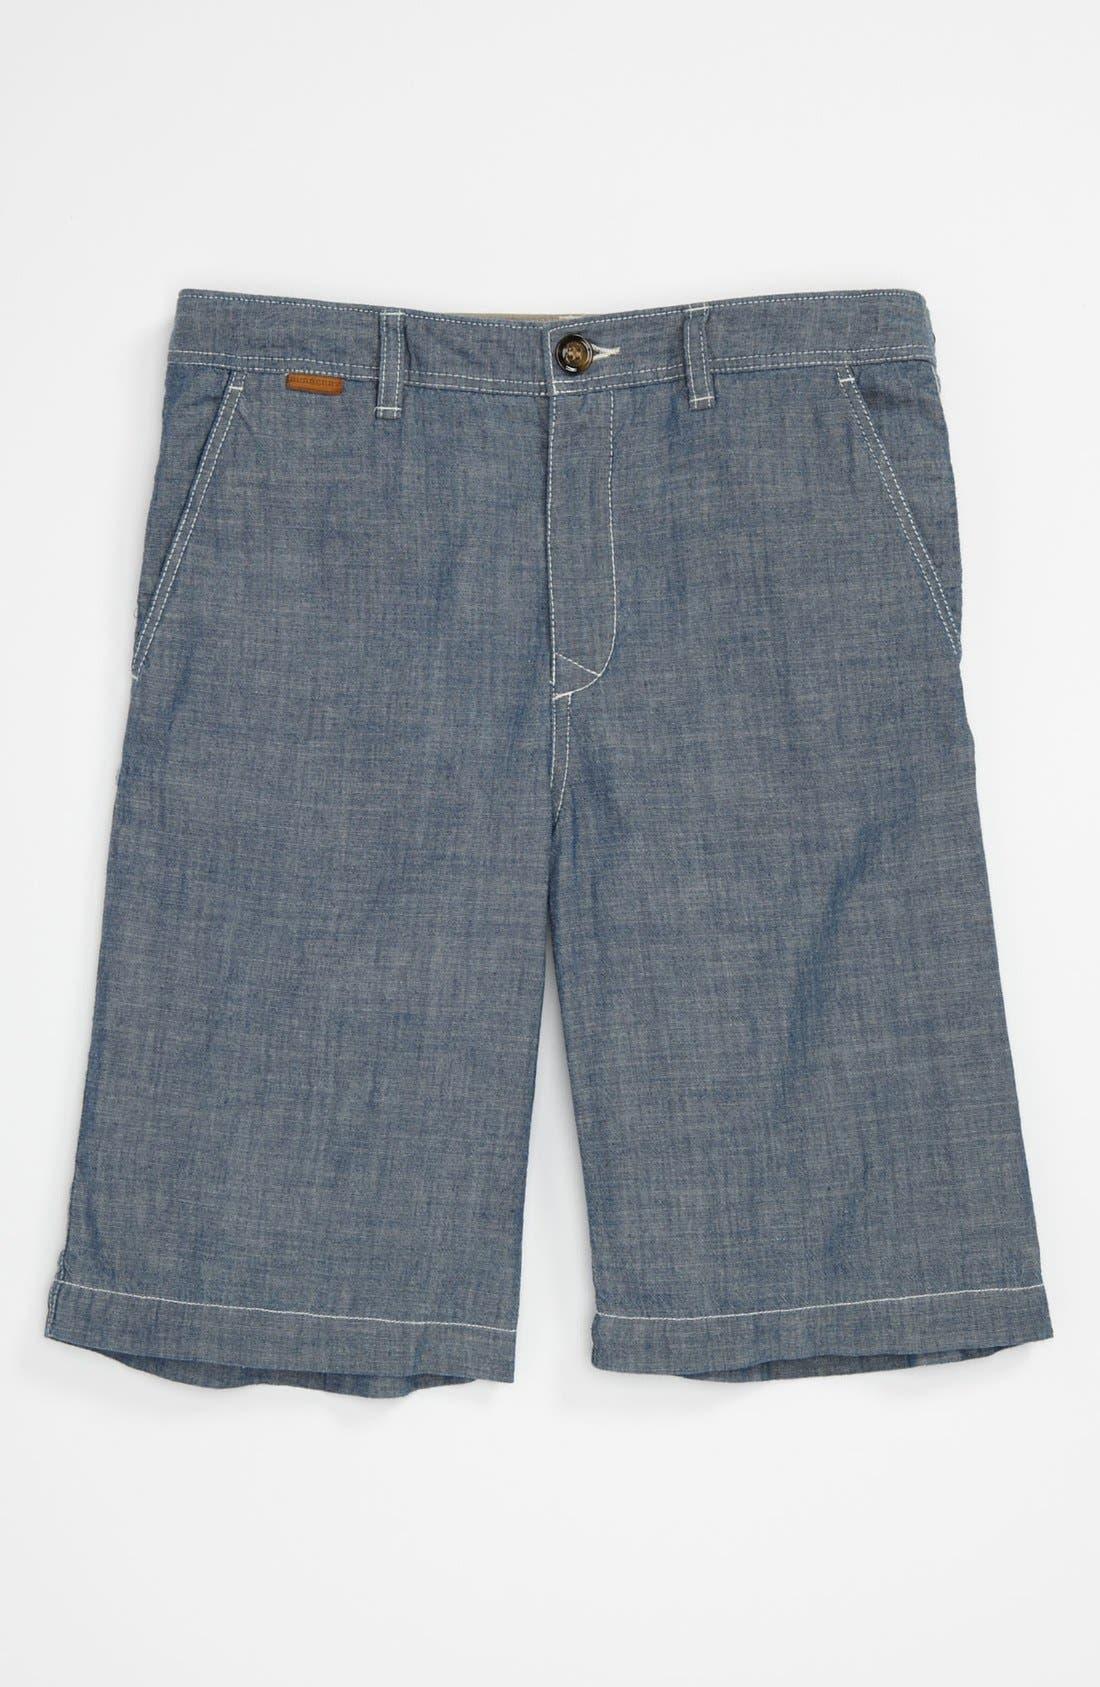 Alternate Image 1 Selected - Burberry 'Santos' Shorts (Little Boys & Big Boys)